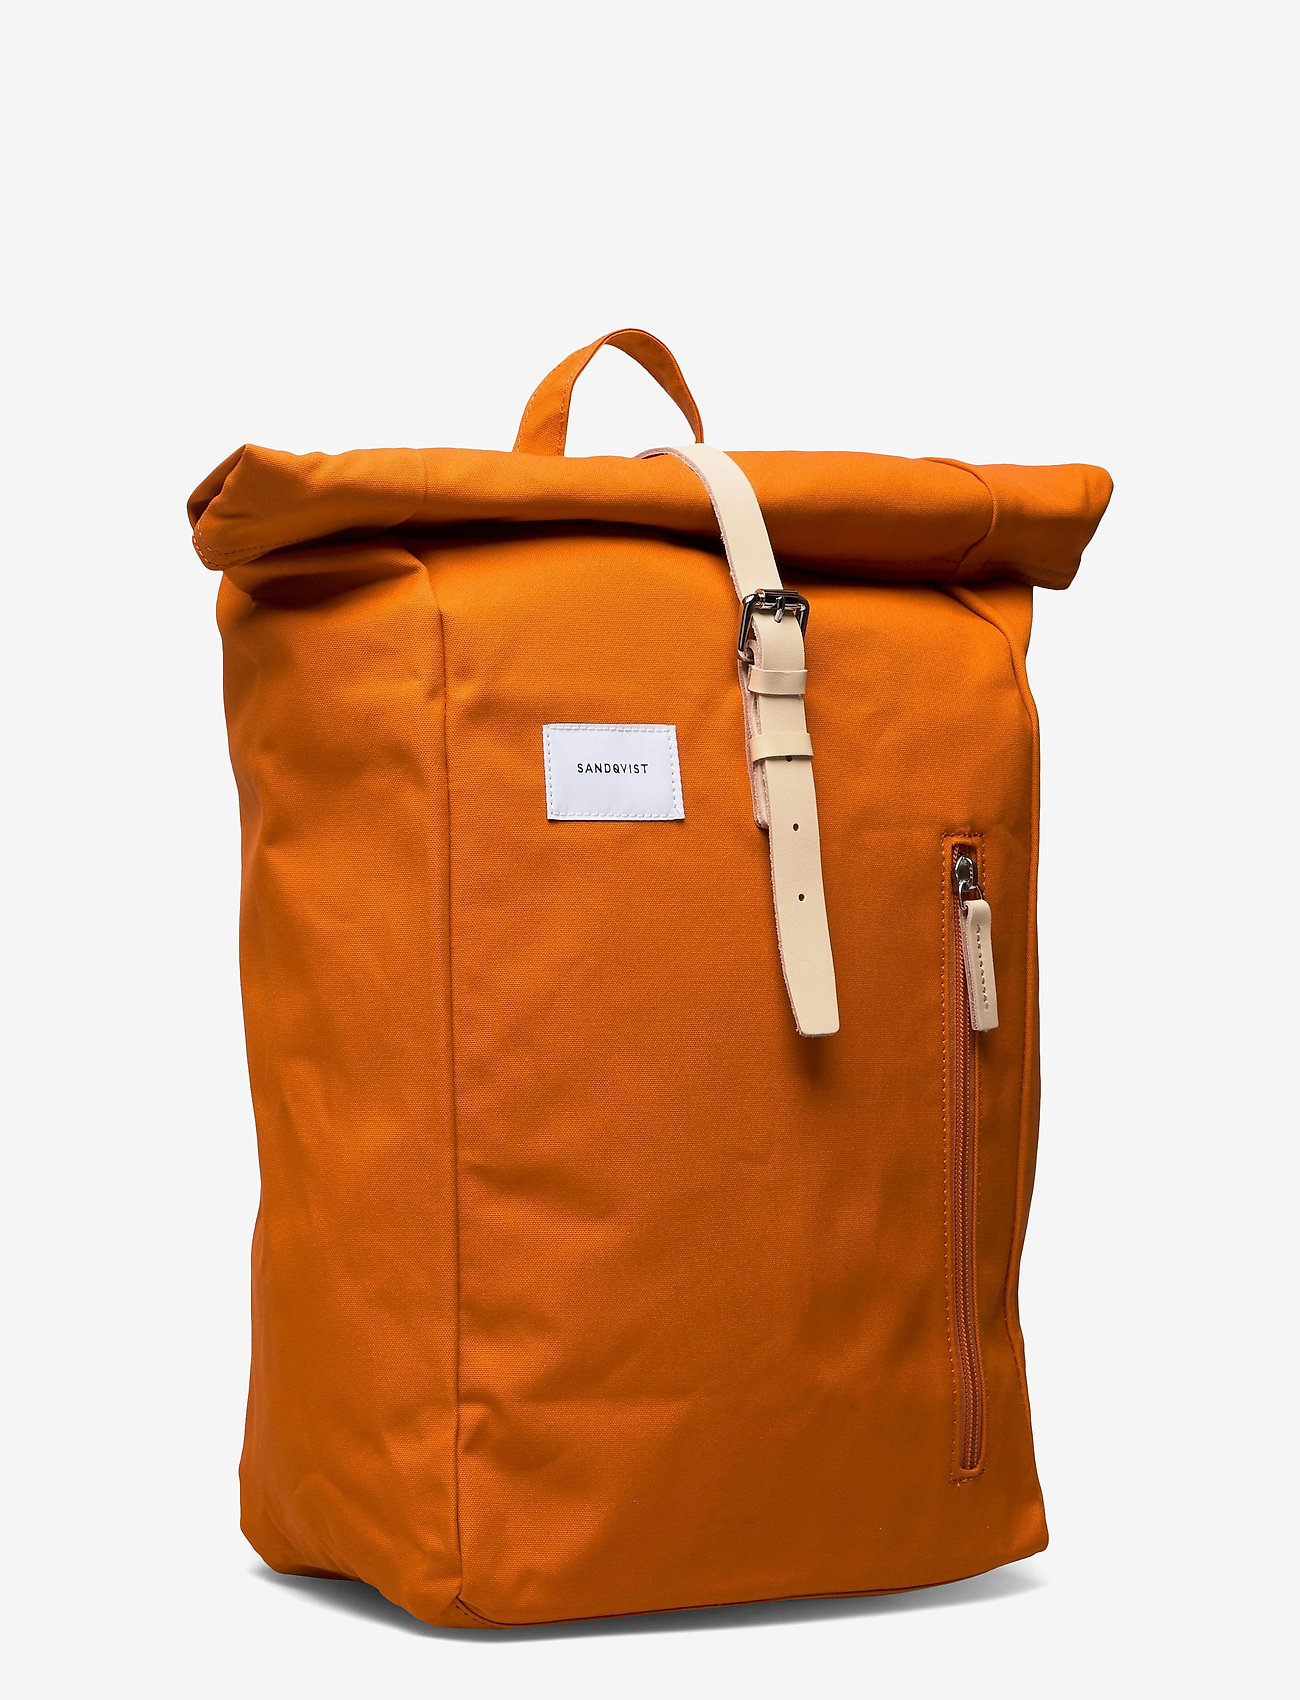 SANDQVIST - DANTE - tassen - burnt orange with natutal leather - 2